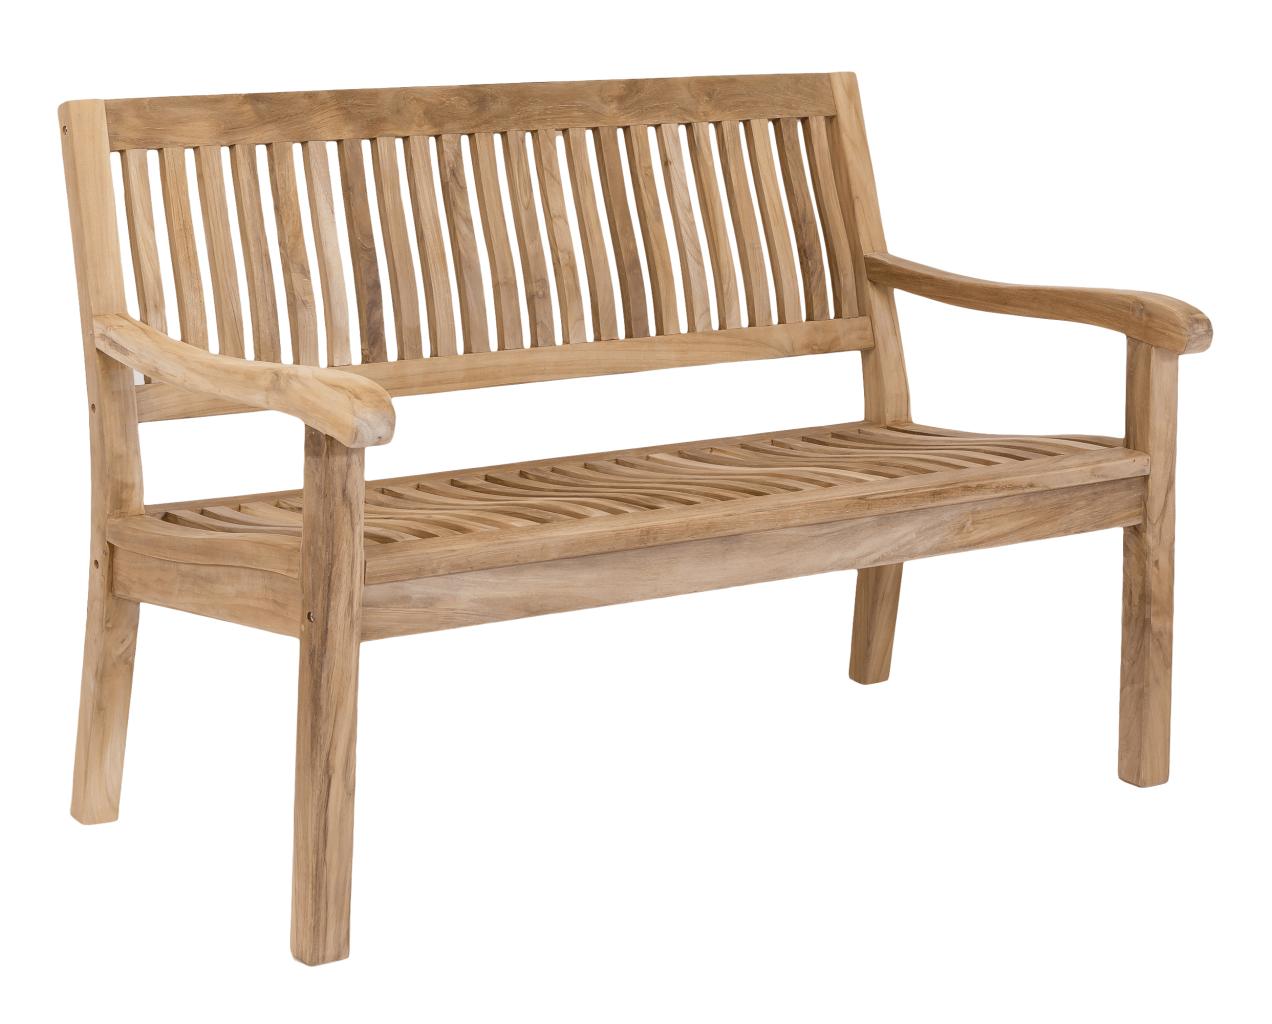 Stabile 3-sitzer Gartenbank Kingsbury in Premium Teak 150 cm